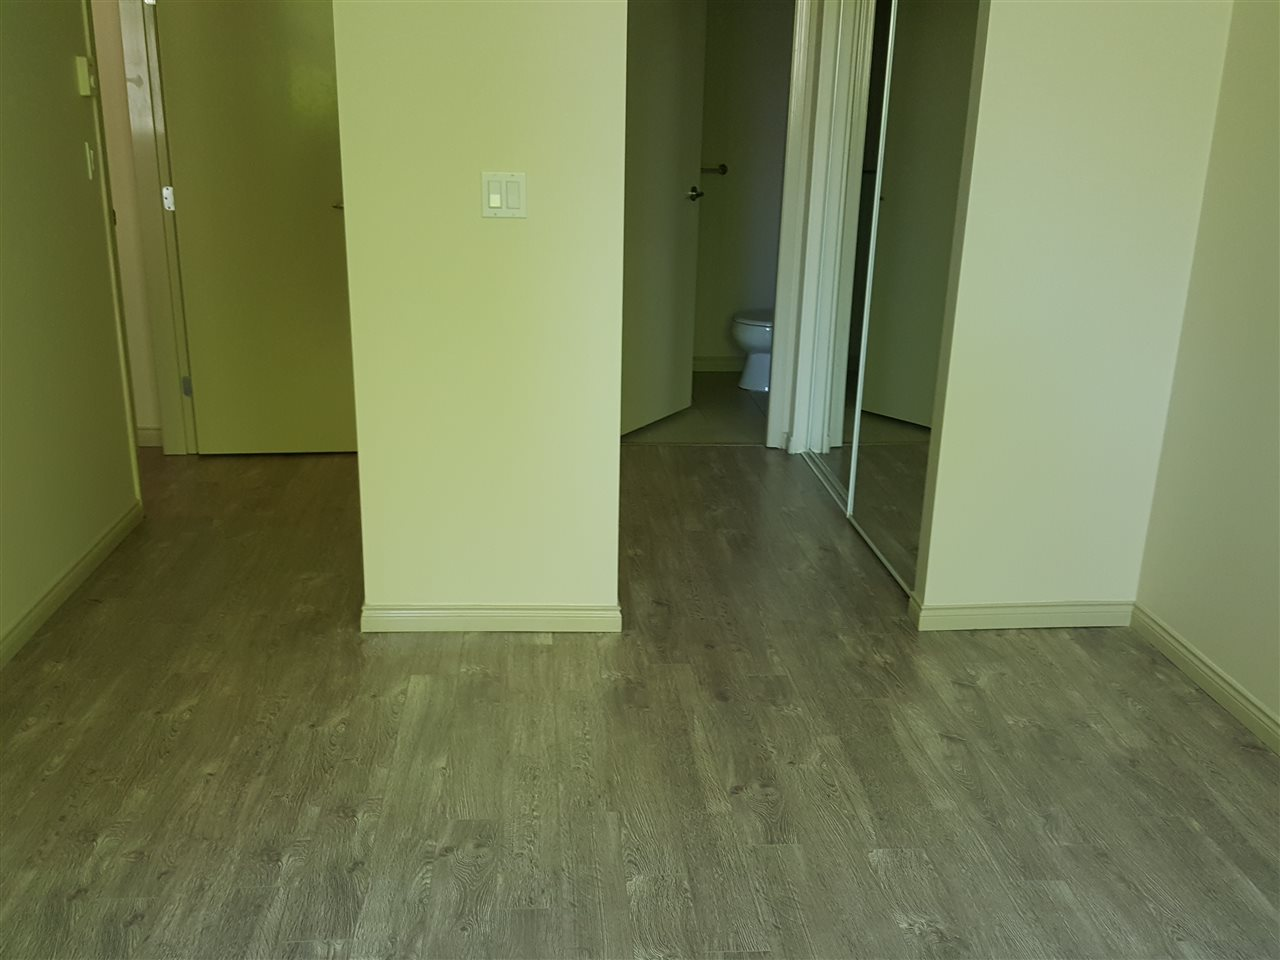 Condo Apartment at 102 6331 BUSWELL STREET, Unit 102, Richmond, British Columbia. Image 10